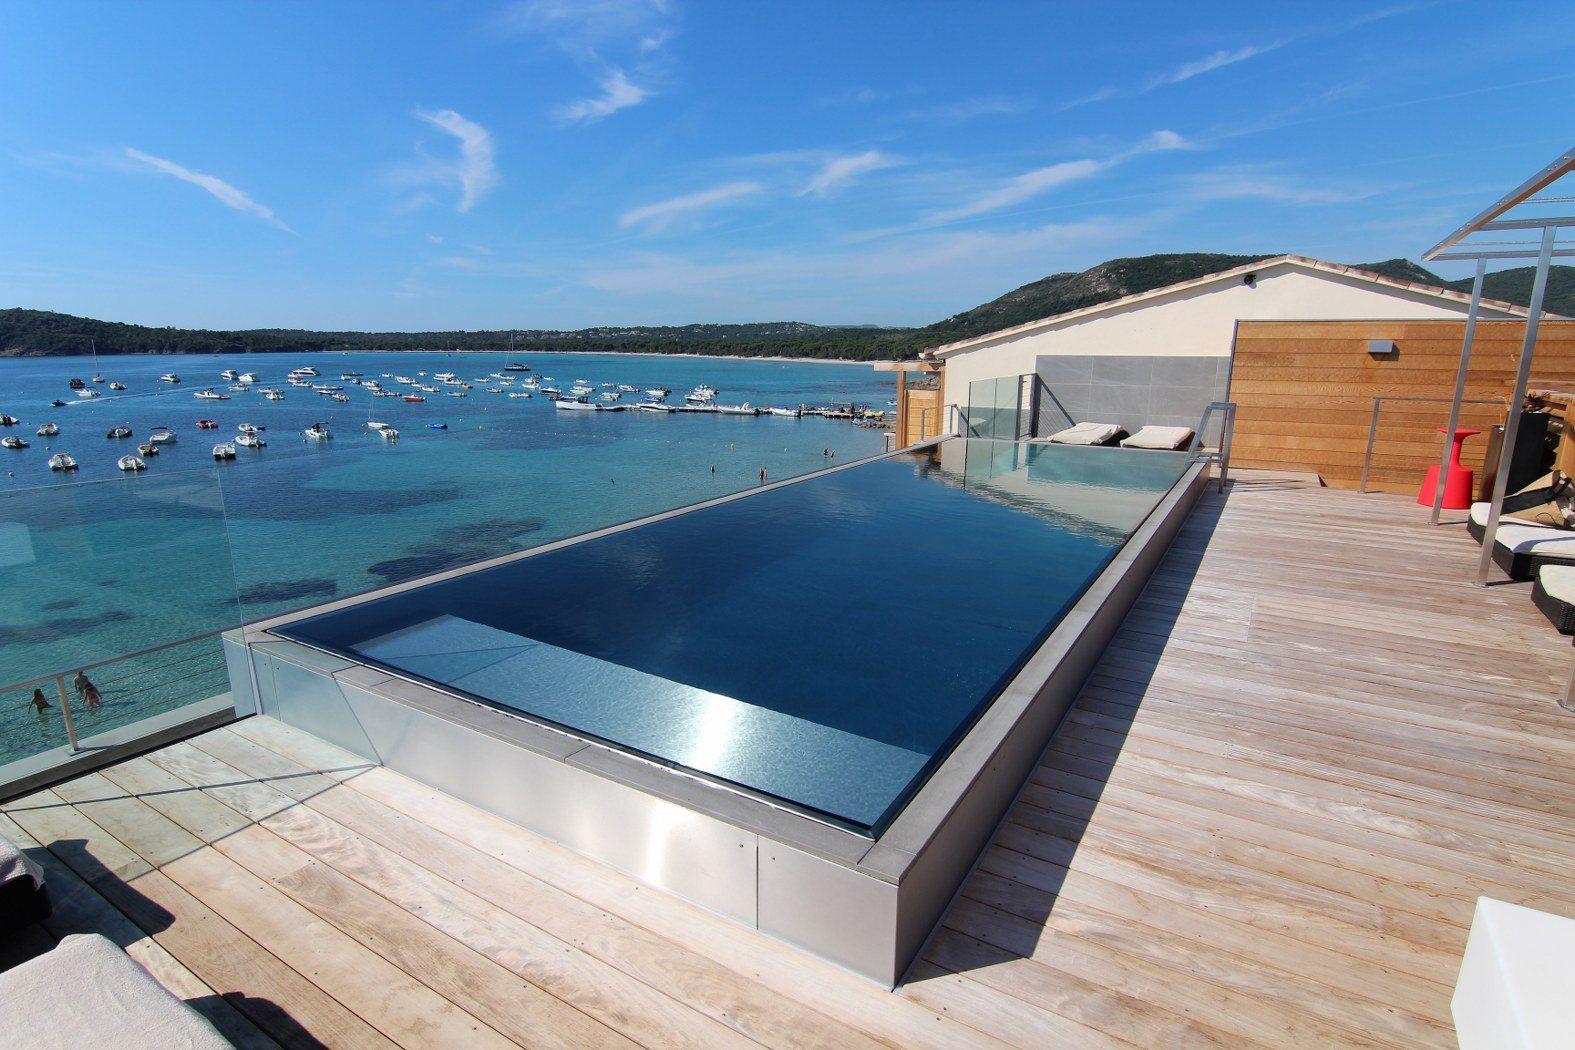 Piscine En Inox Steel And Style stainless steel pool | architektur, haus umbau, Überlaufpool